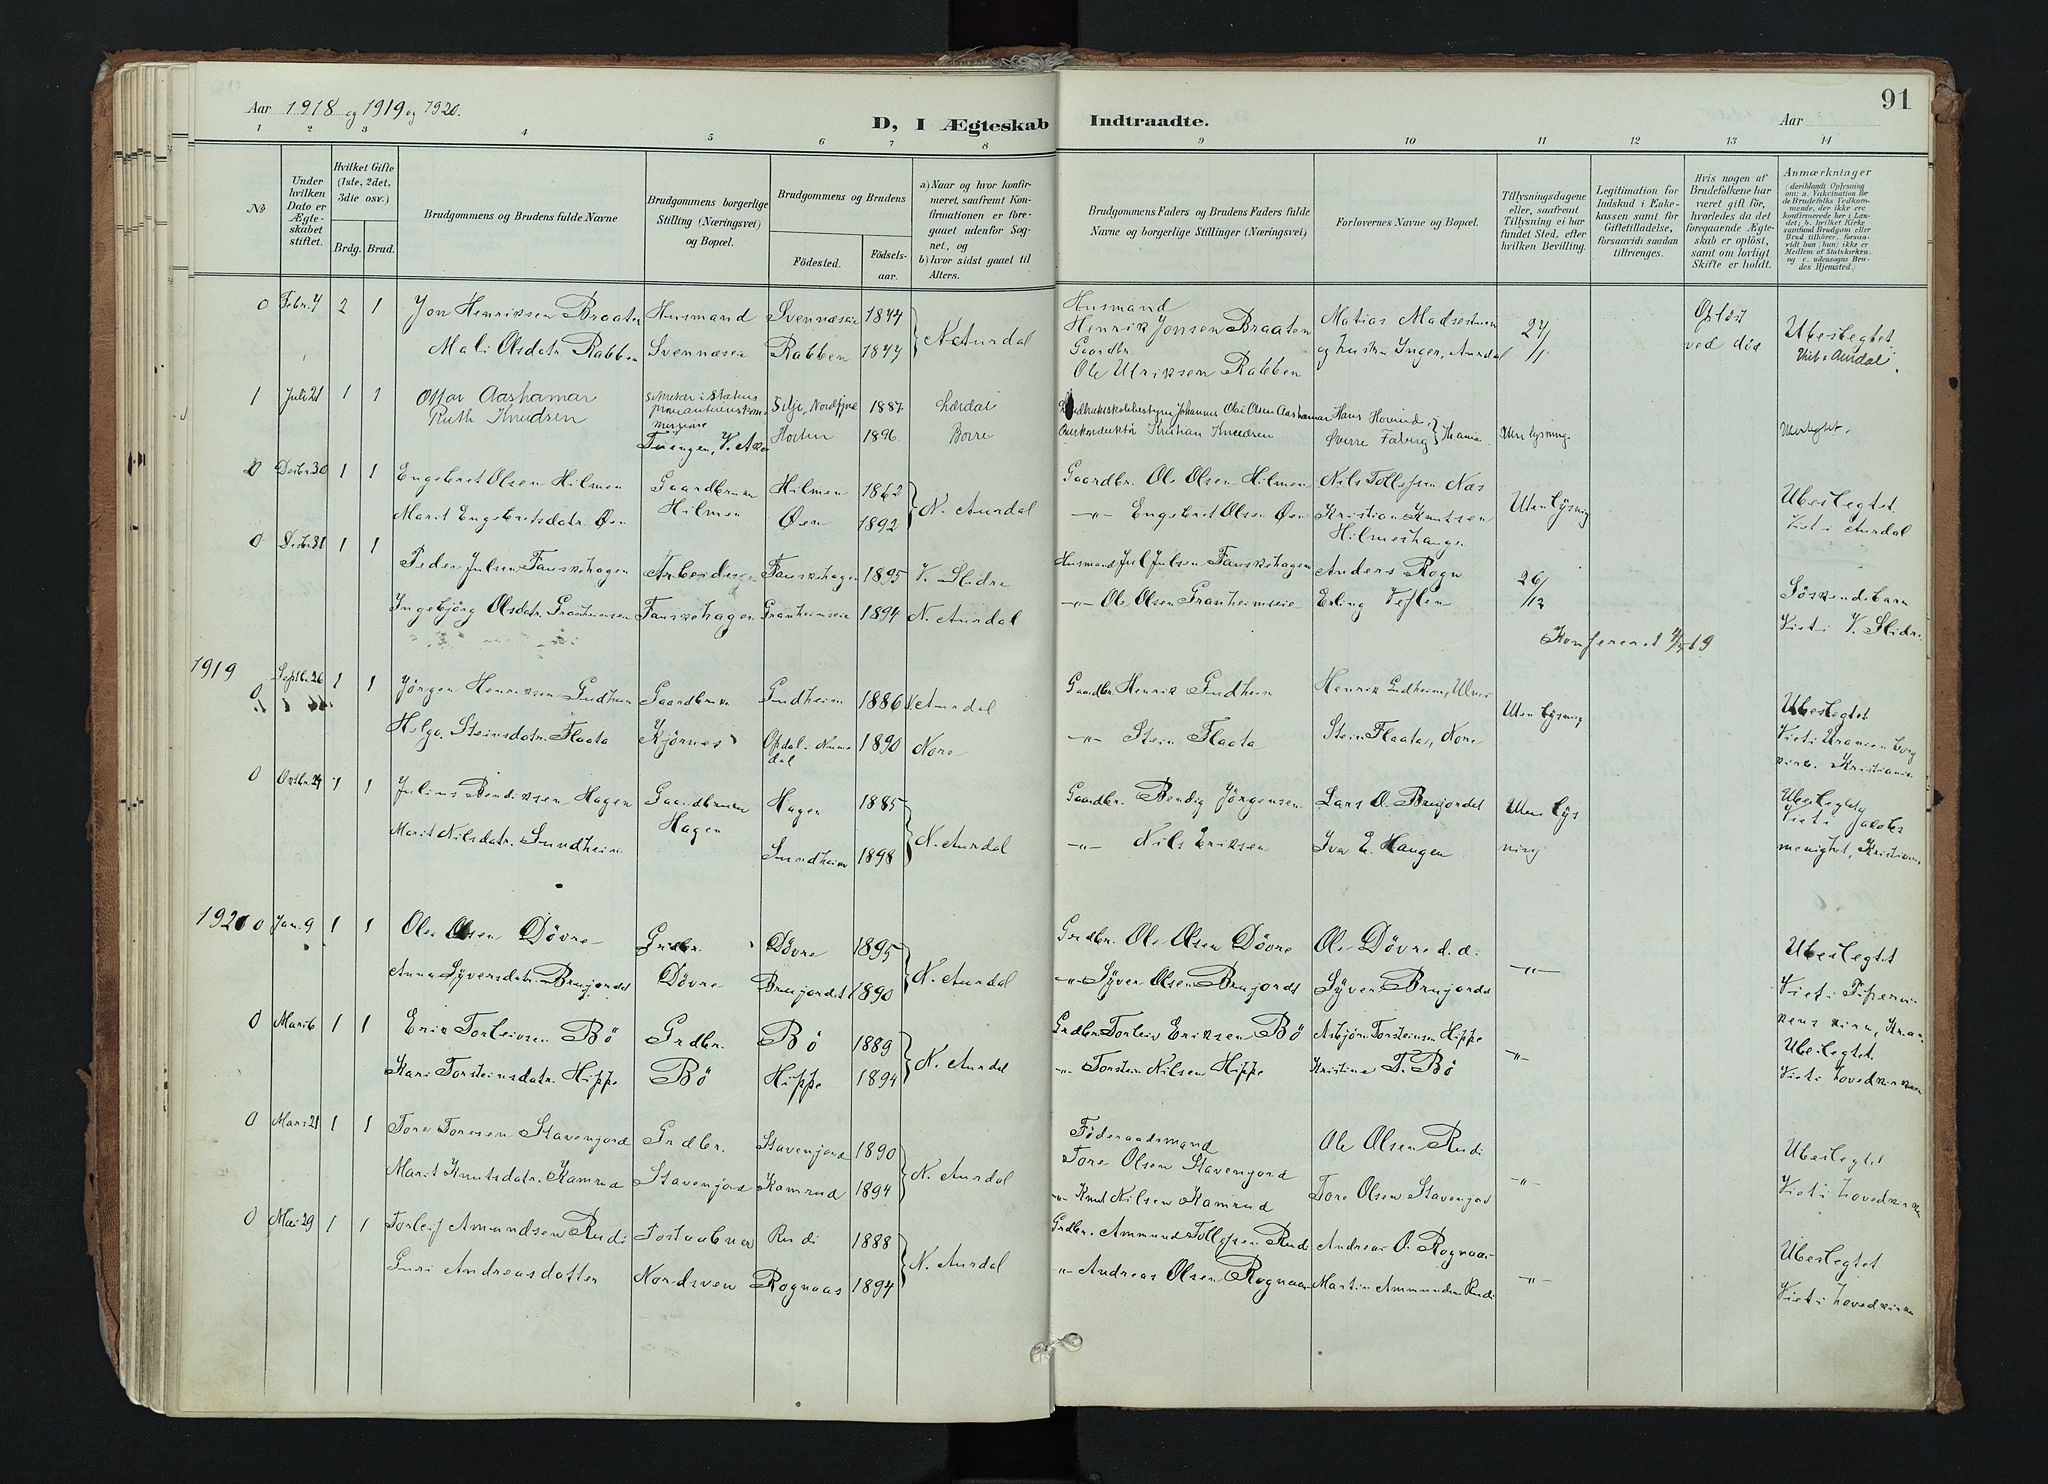 SAH, Nord-Aurdal prestekontor, Ministerialbok nr. 17, 1897-1926, s. 91